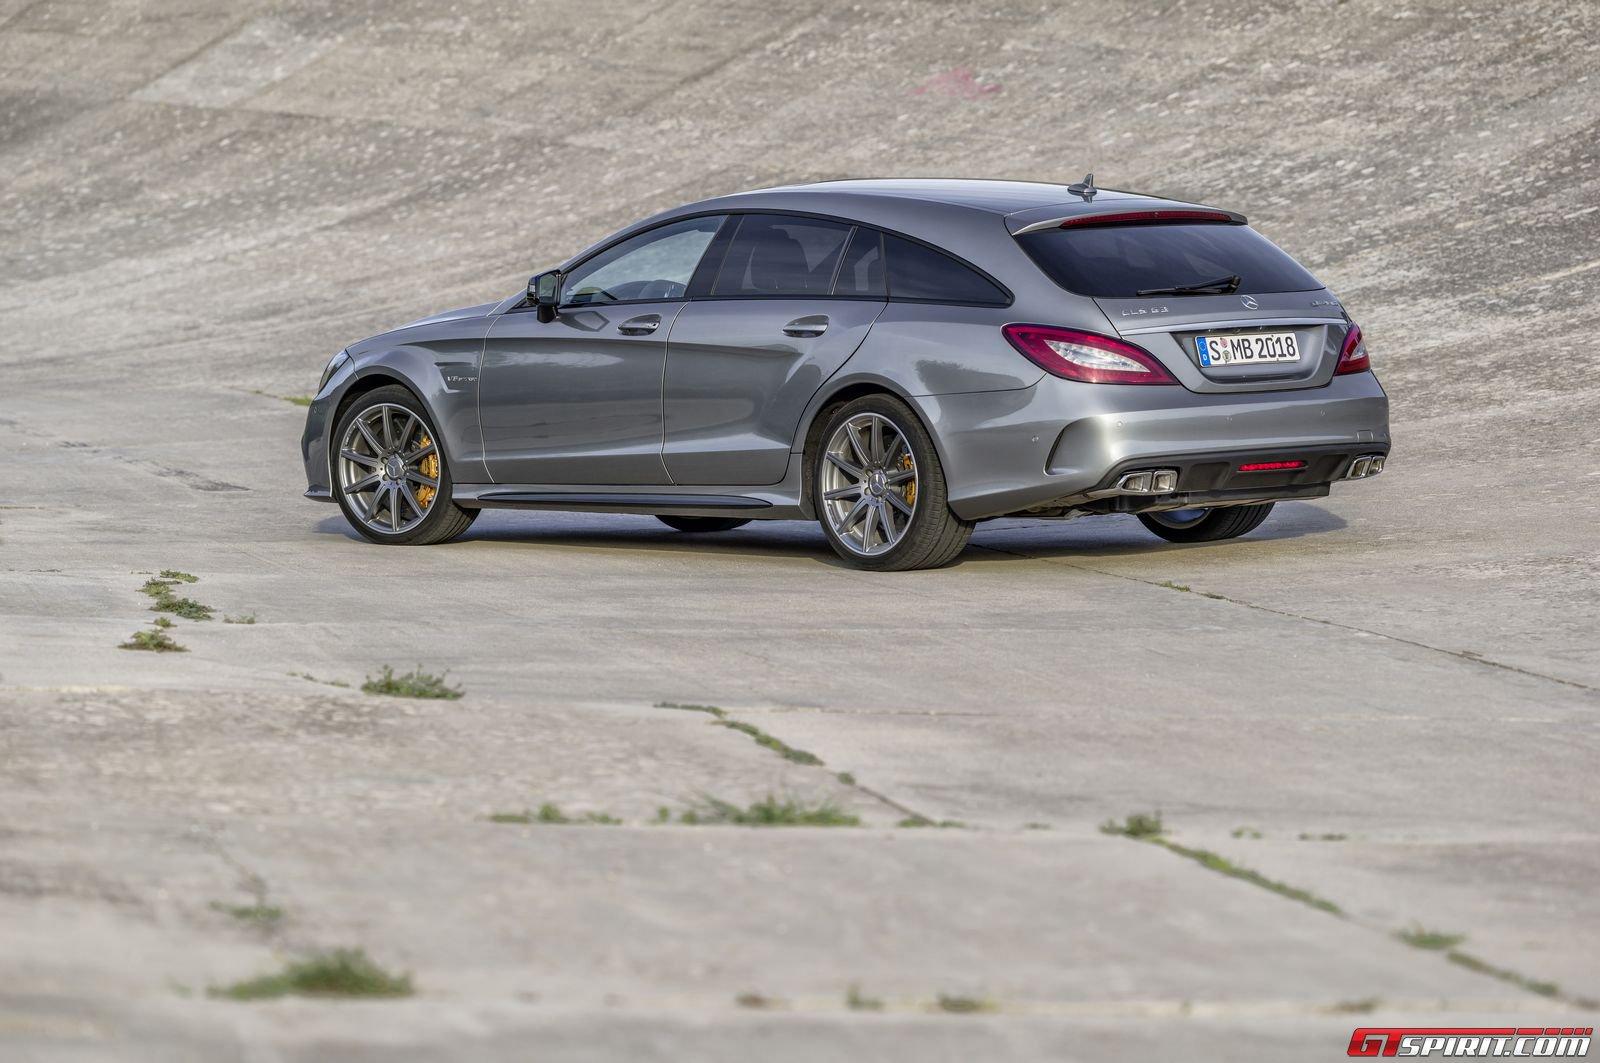 Mercedes benz cls klasse facelift x 218 2014 for Mercedes benz cls550 review